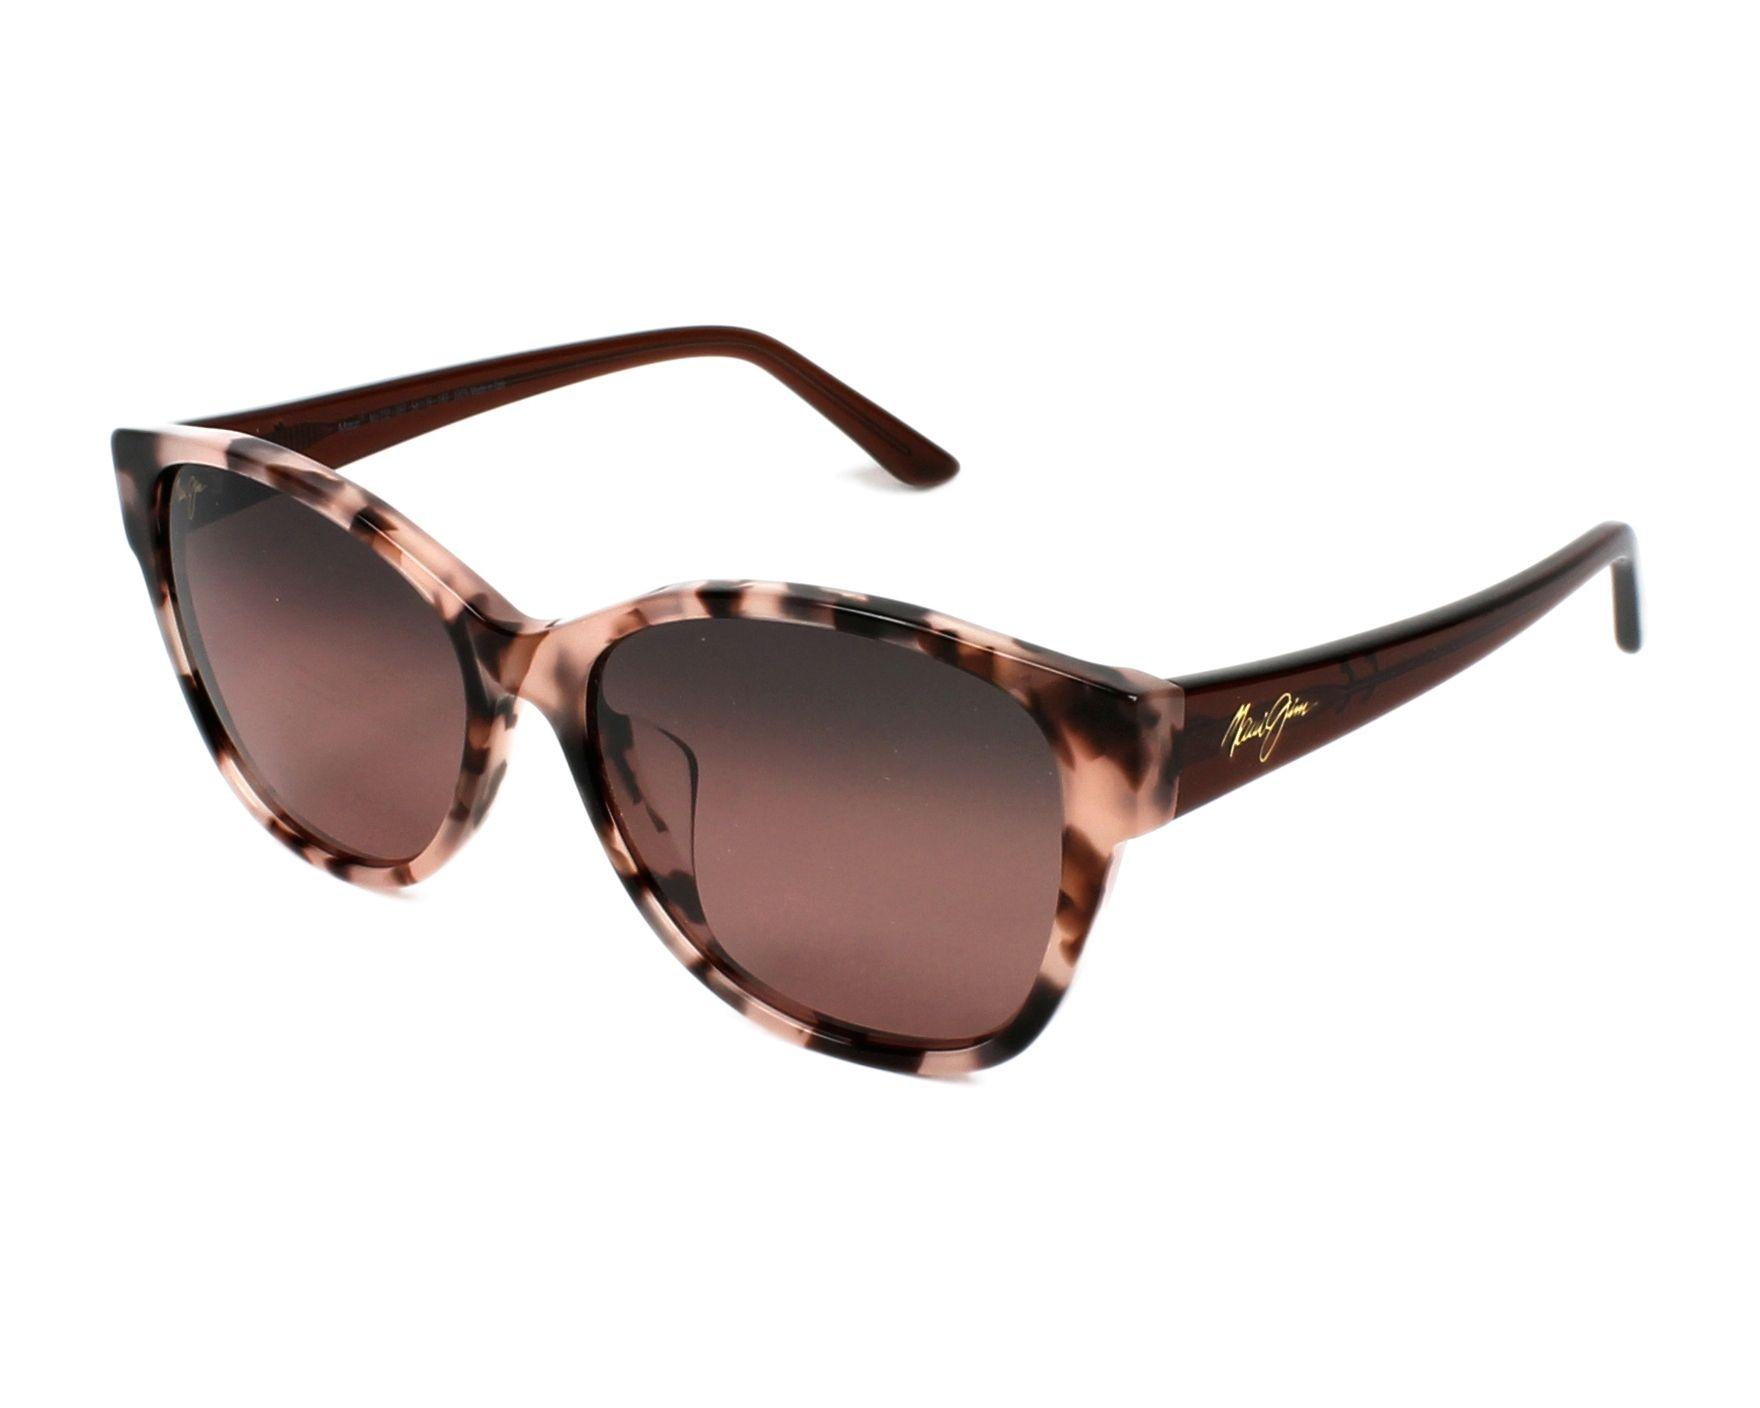 3f712e8824f7 Sunglasses Maui Jim RS-732 09T - Purple profile view